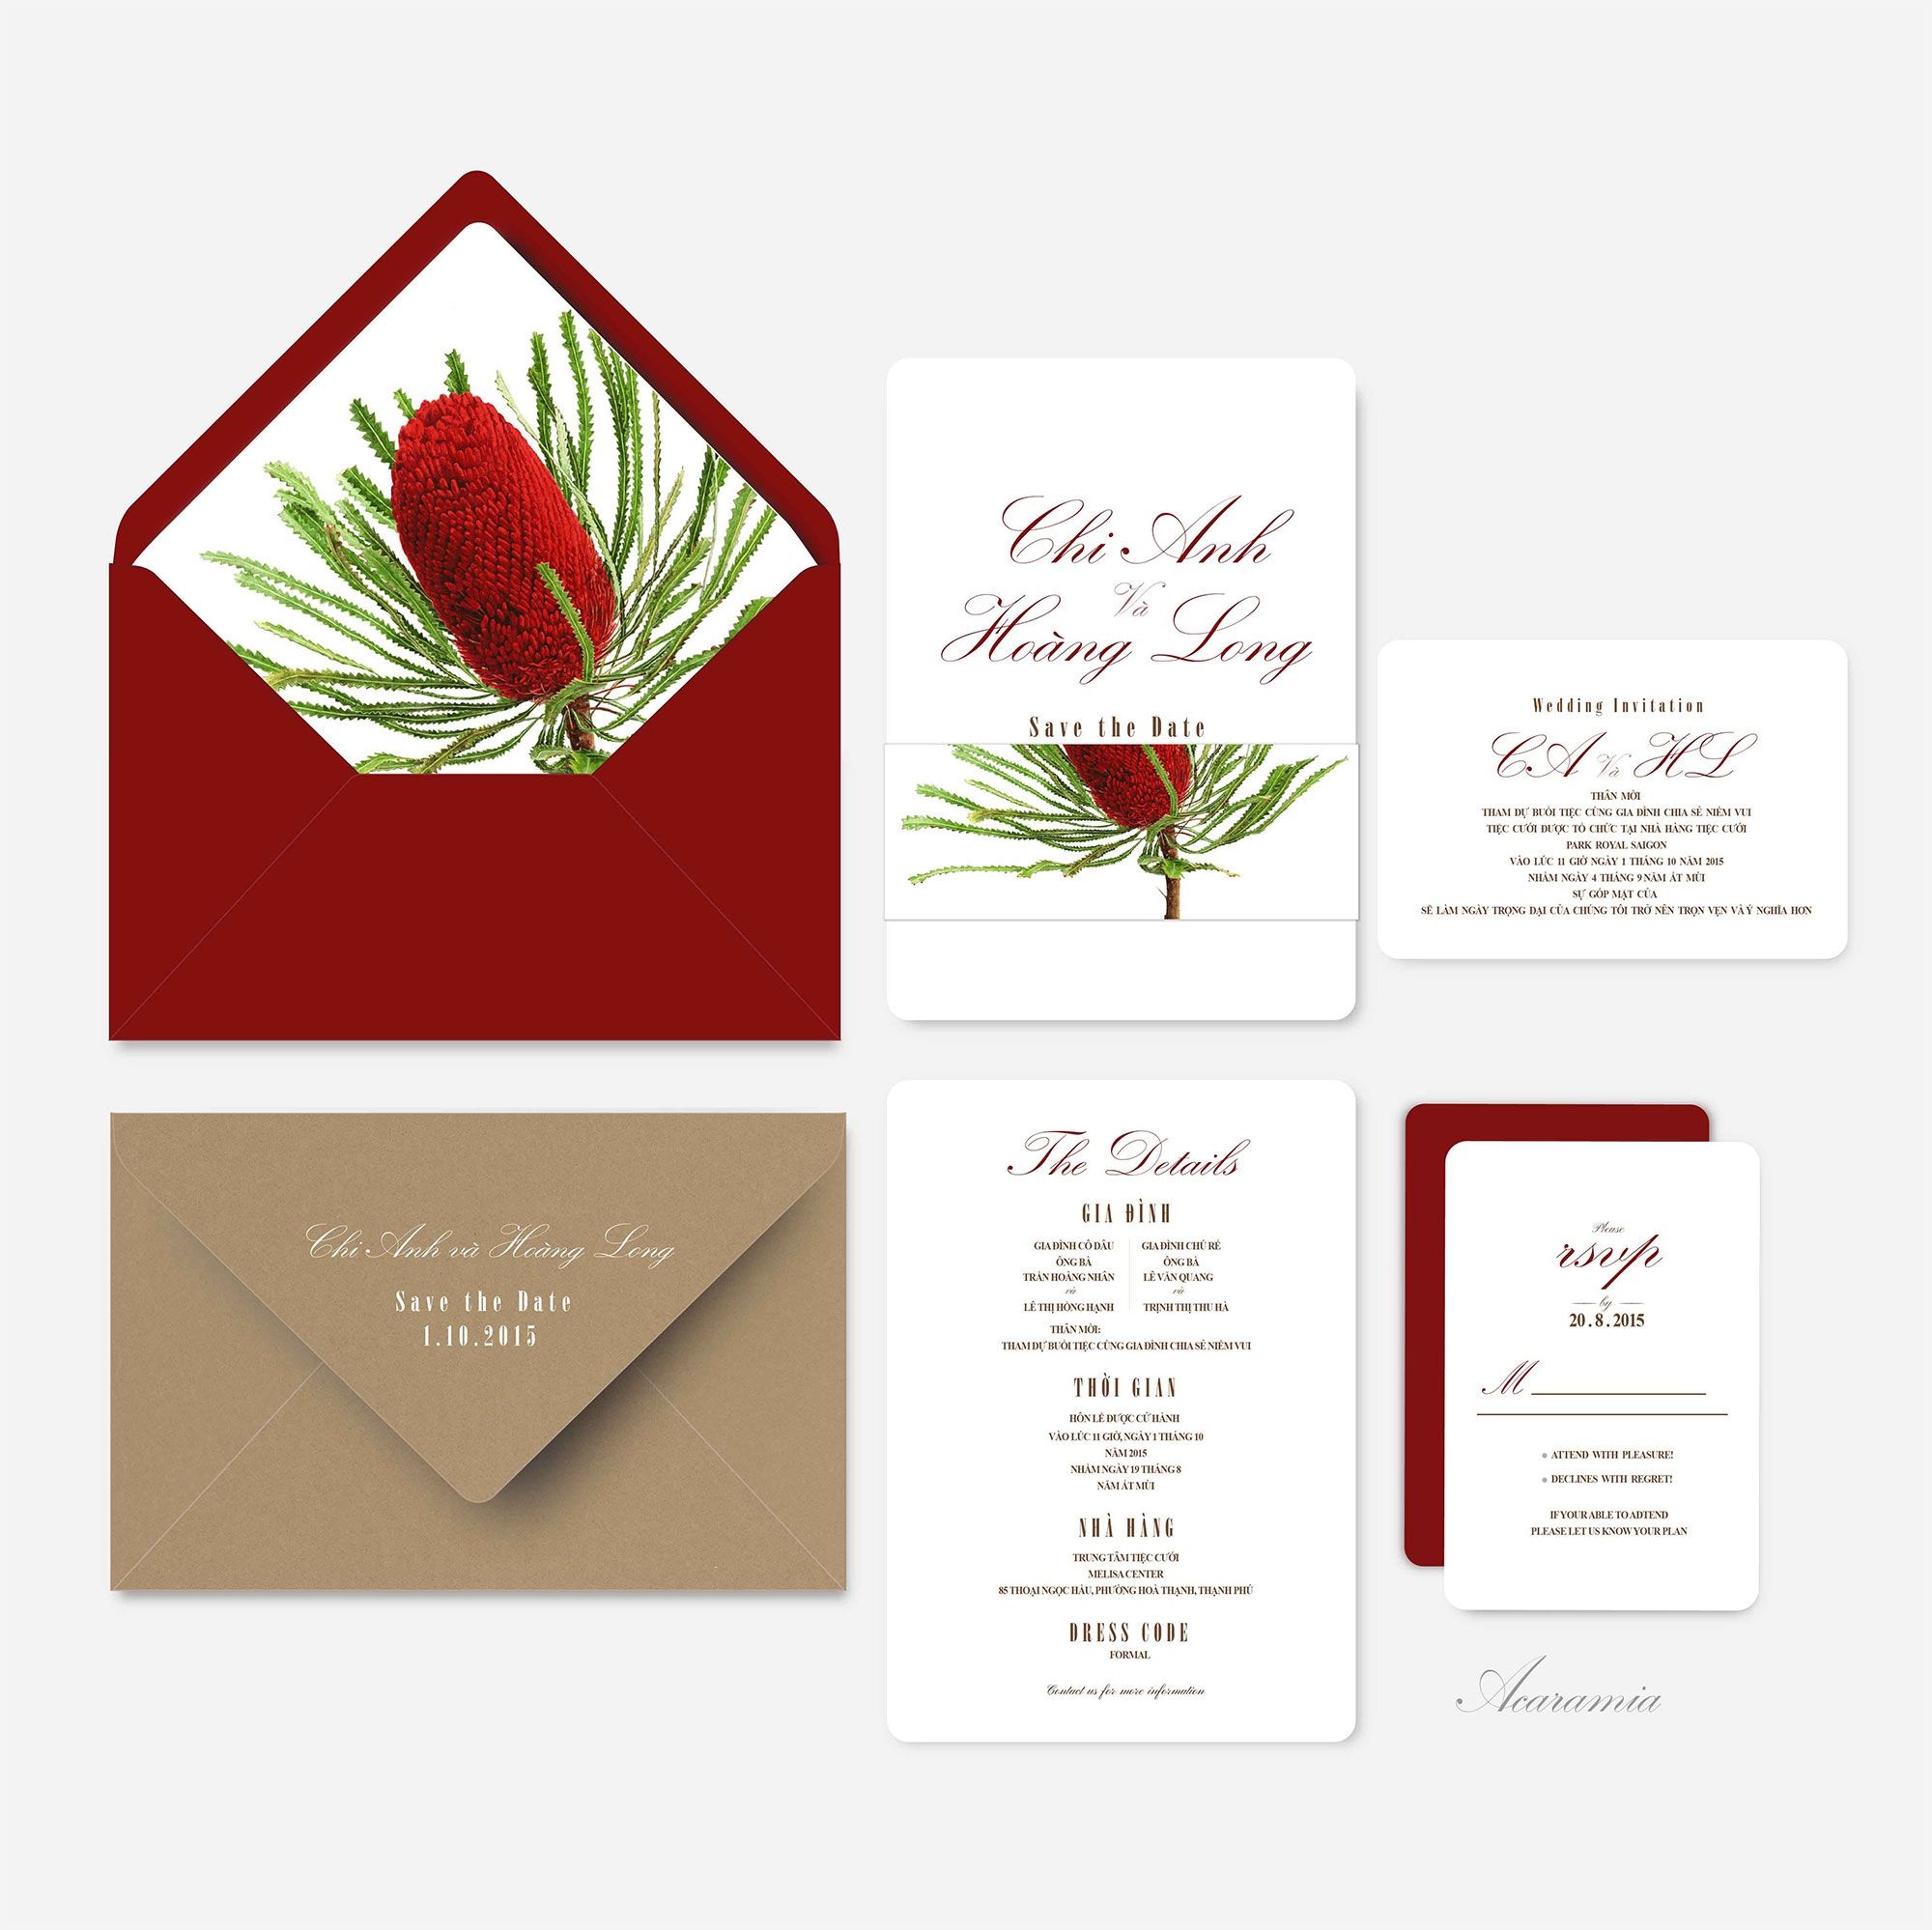 Banksia Small | Wedding Invitations Card | Pinterest | Wedding ...